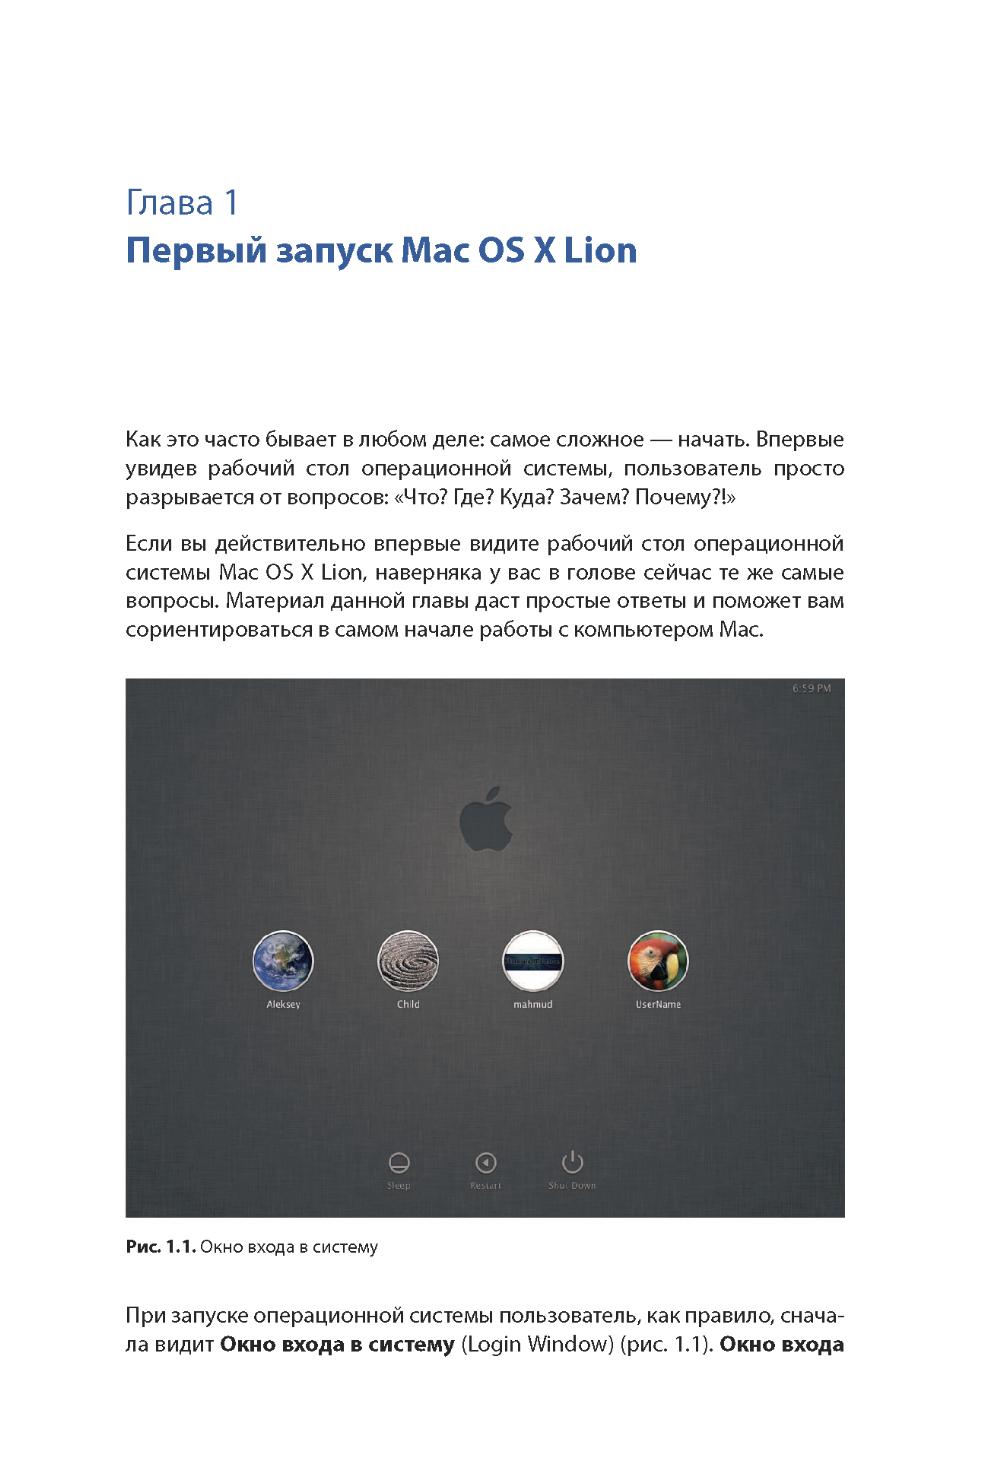 http://i6.imageban.ru/out/2013/12/13/bb819d00d5f05d0b3891973b16dcc012.jpg